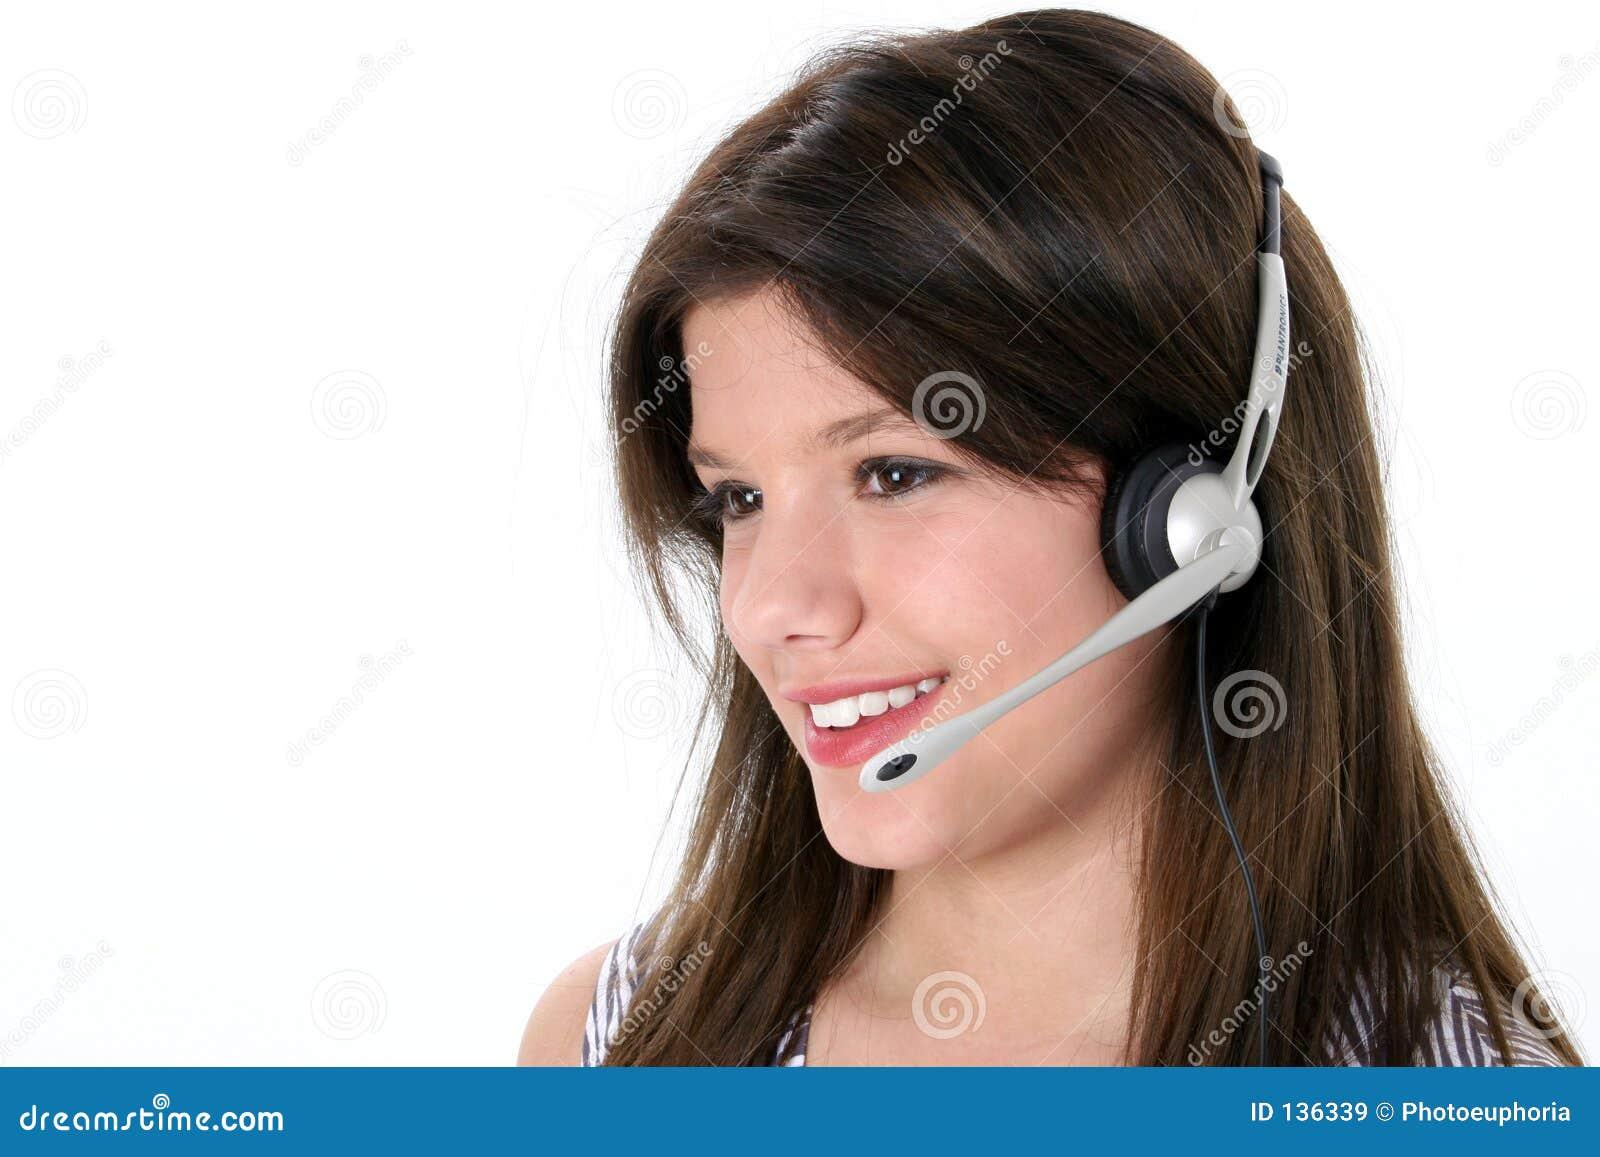 Homework helpline